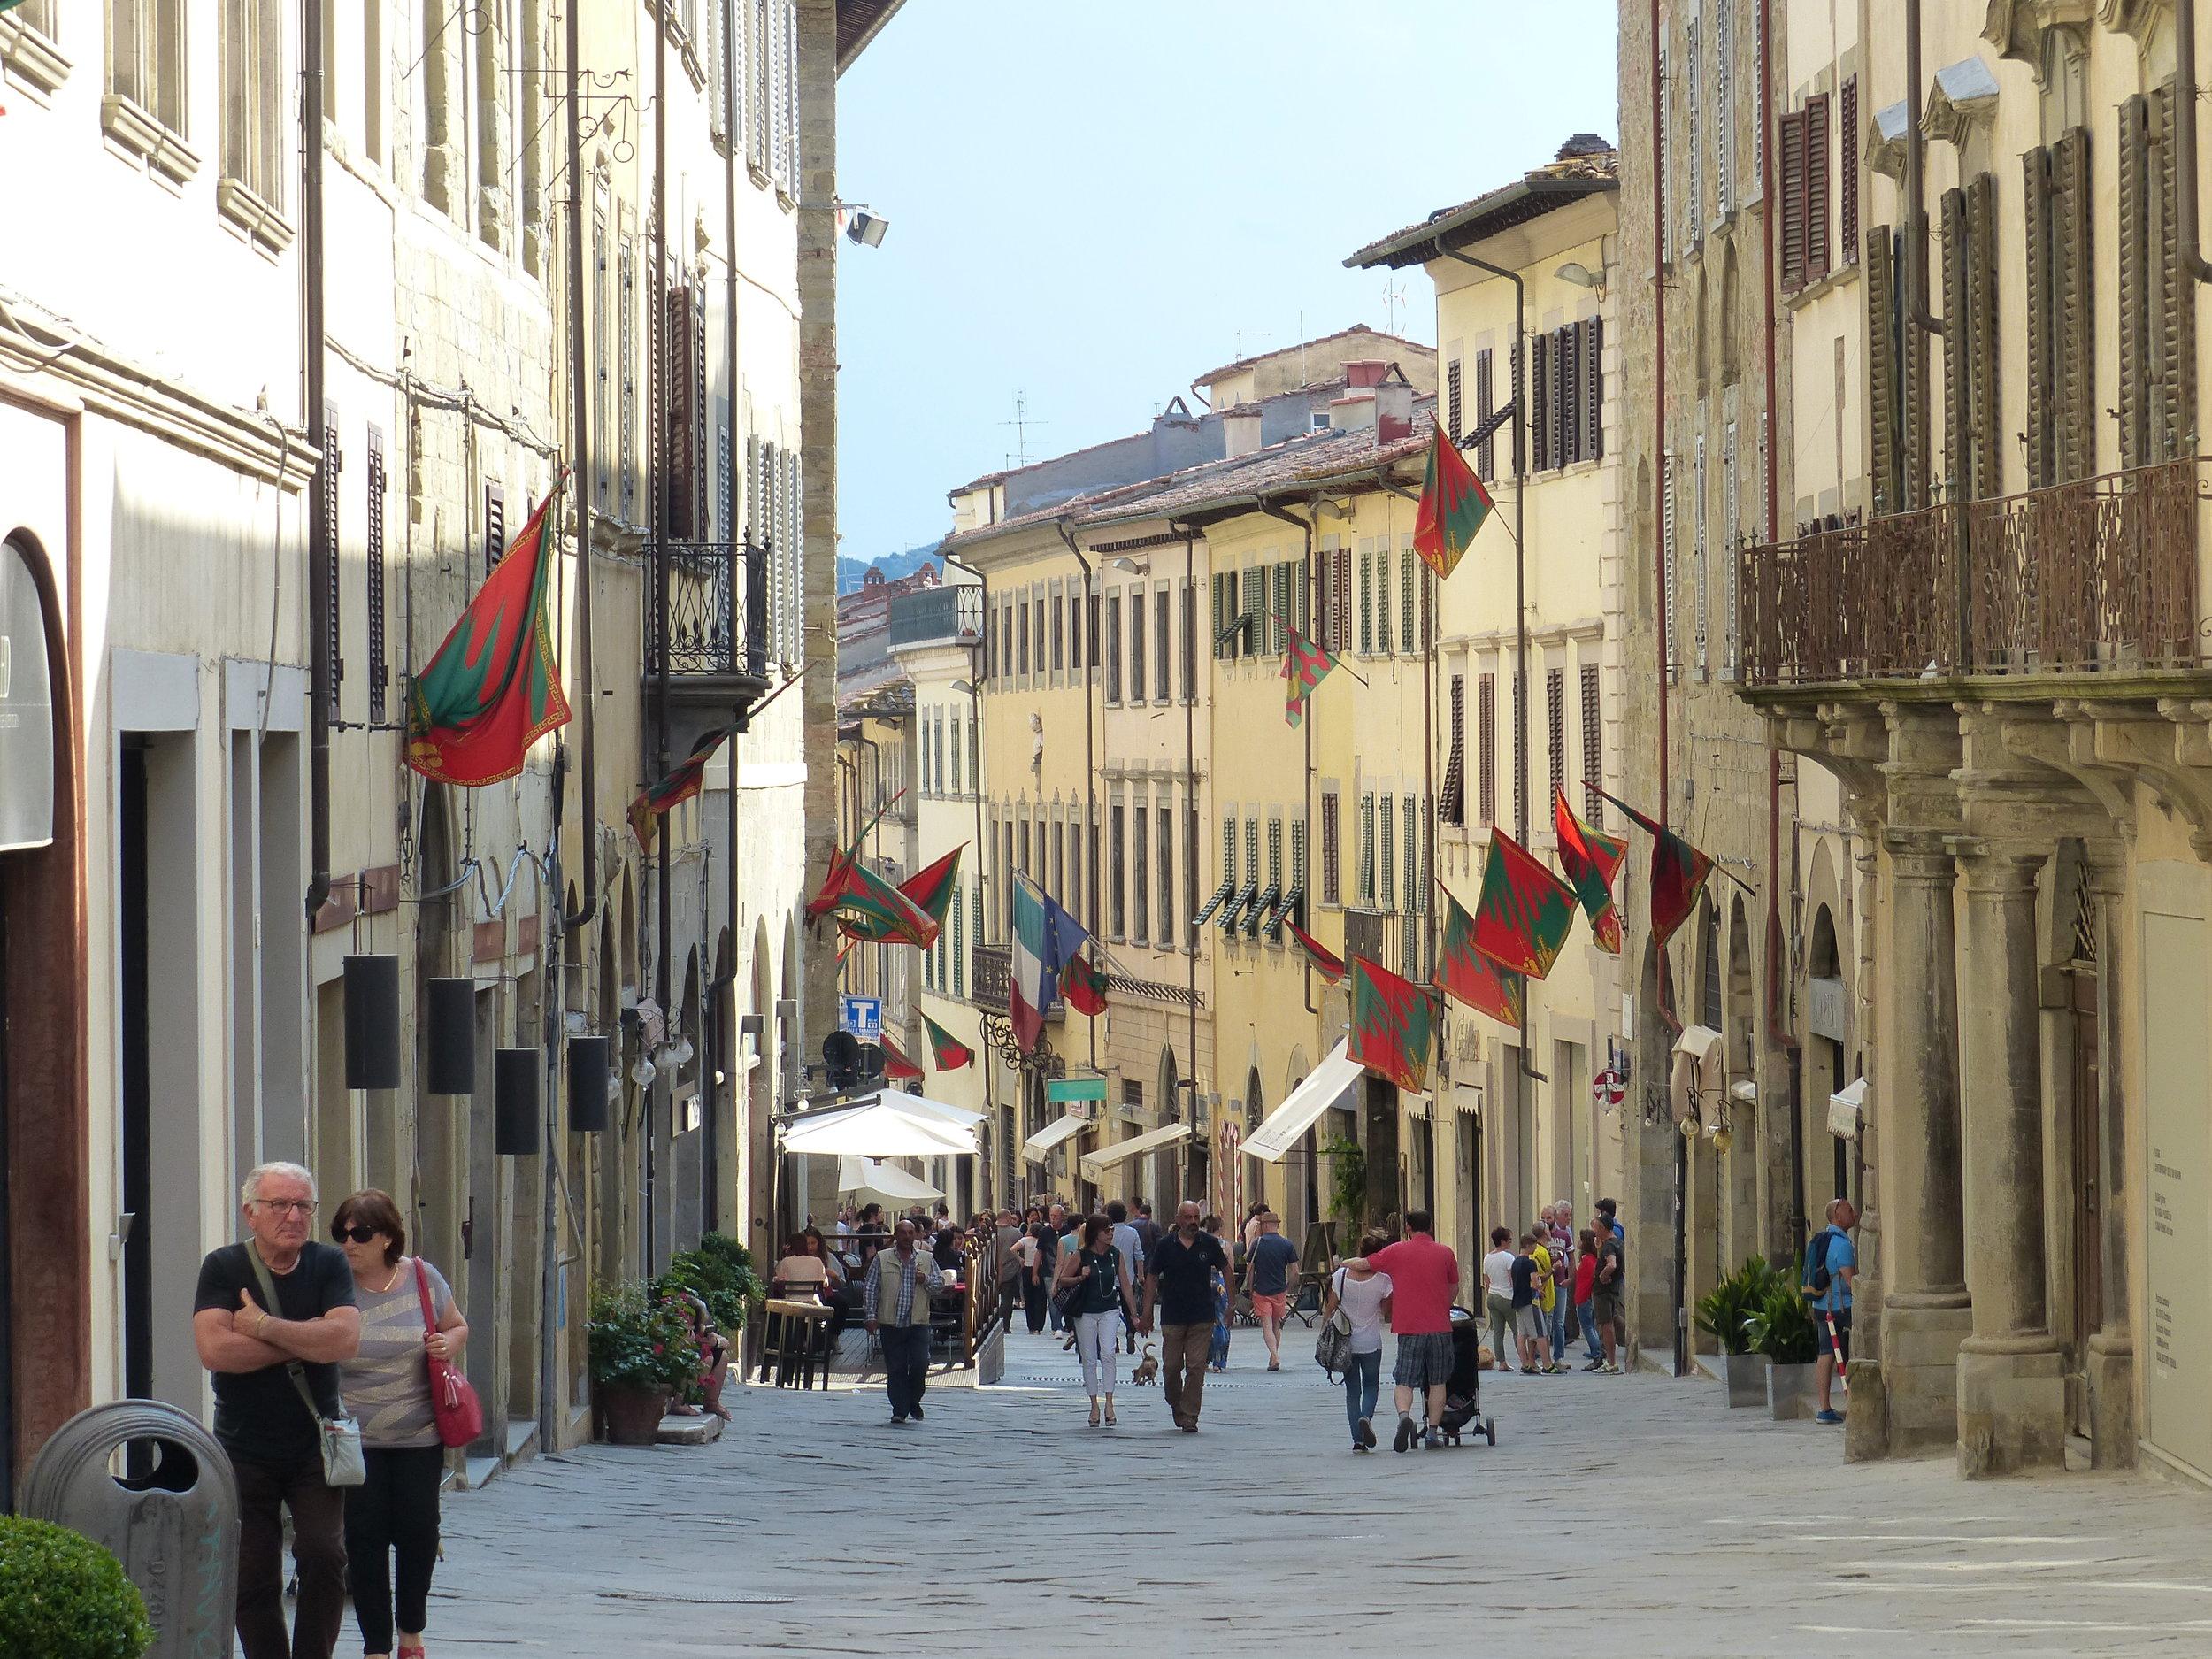 Street in Arezzo, Tuscany